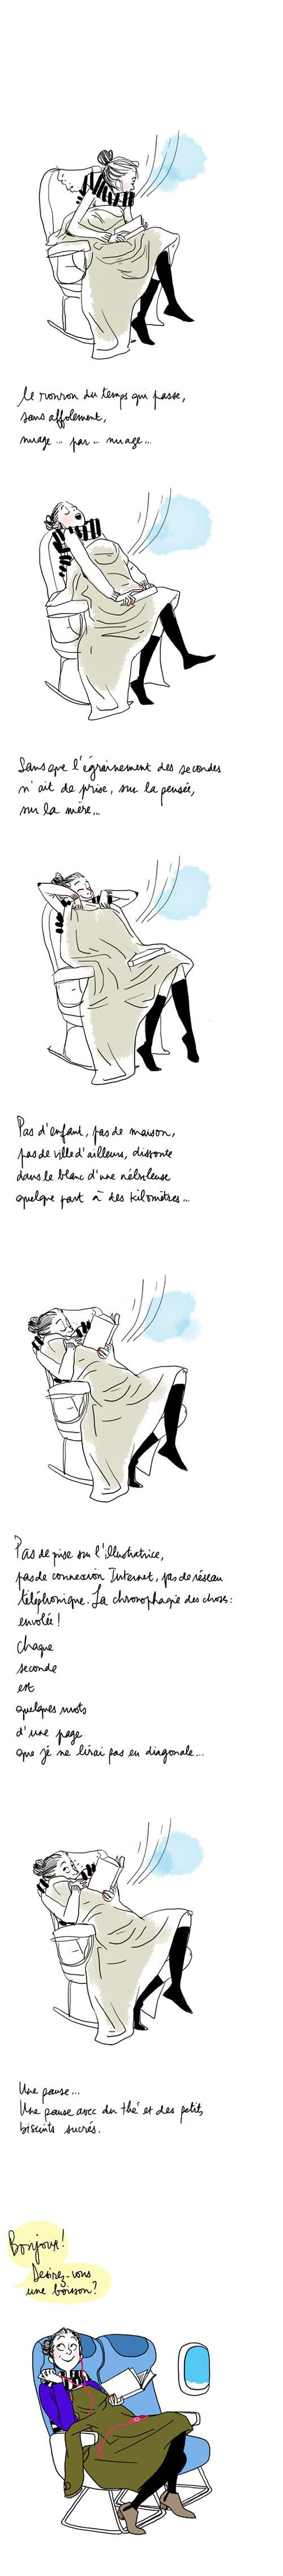 Illustration Margot Motin #2  Vertical storyboarding